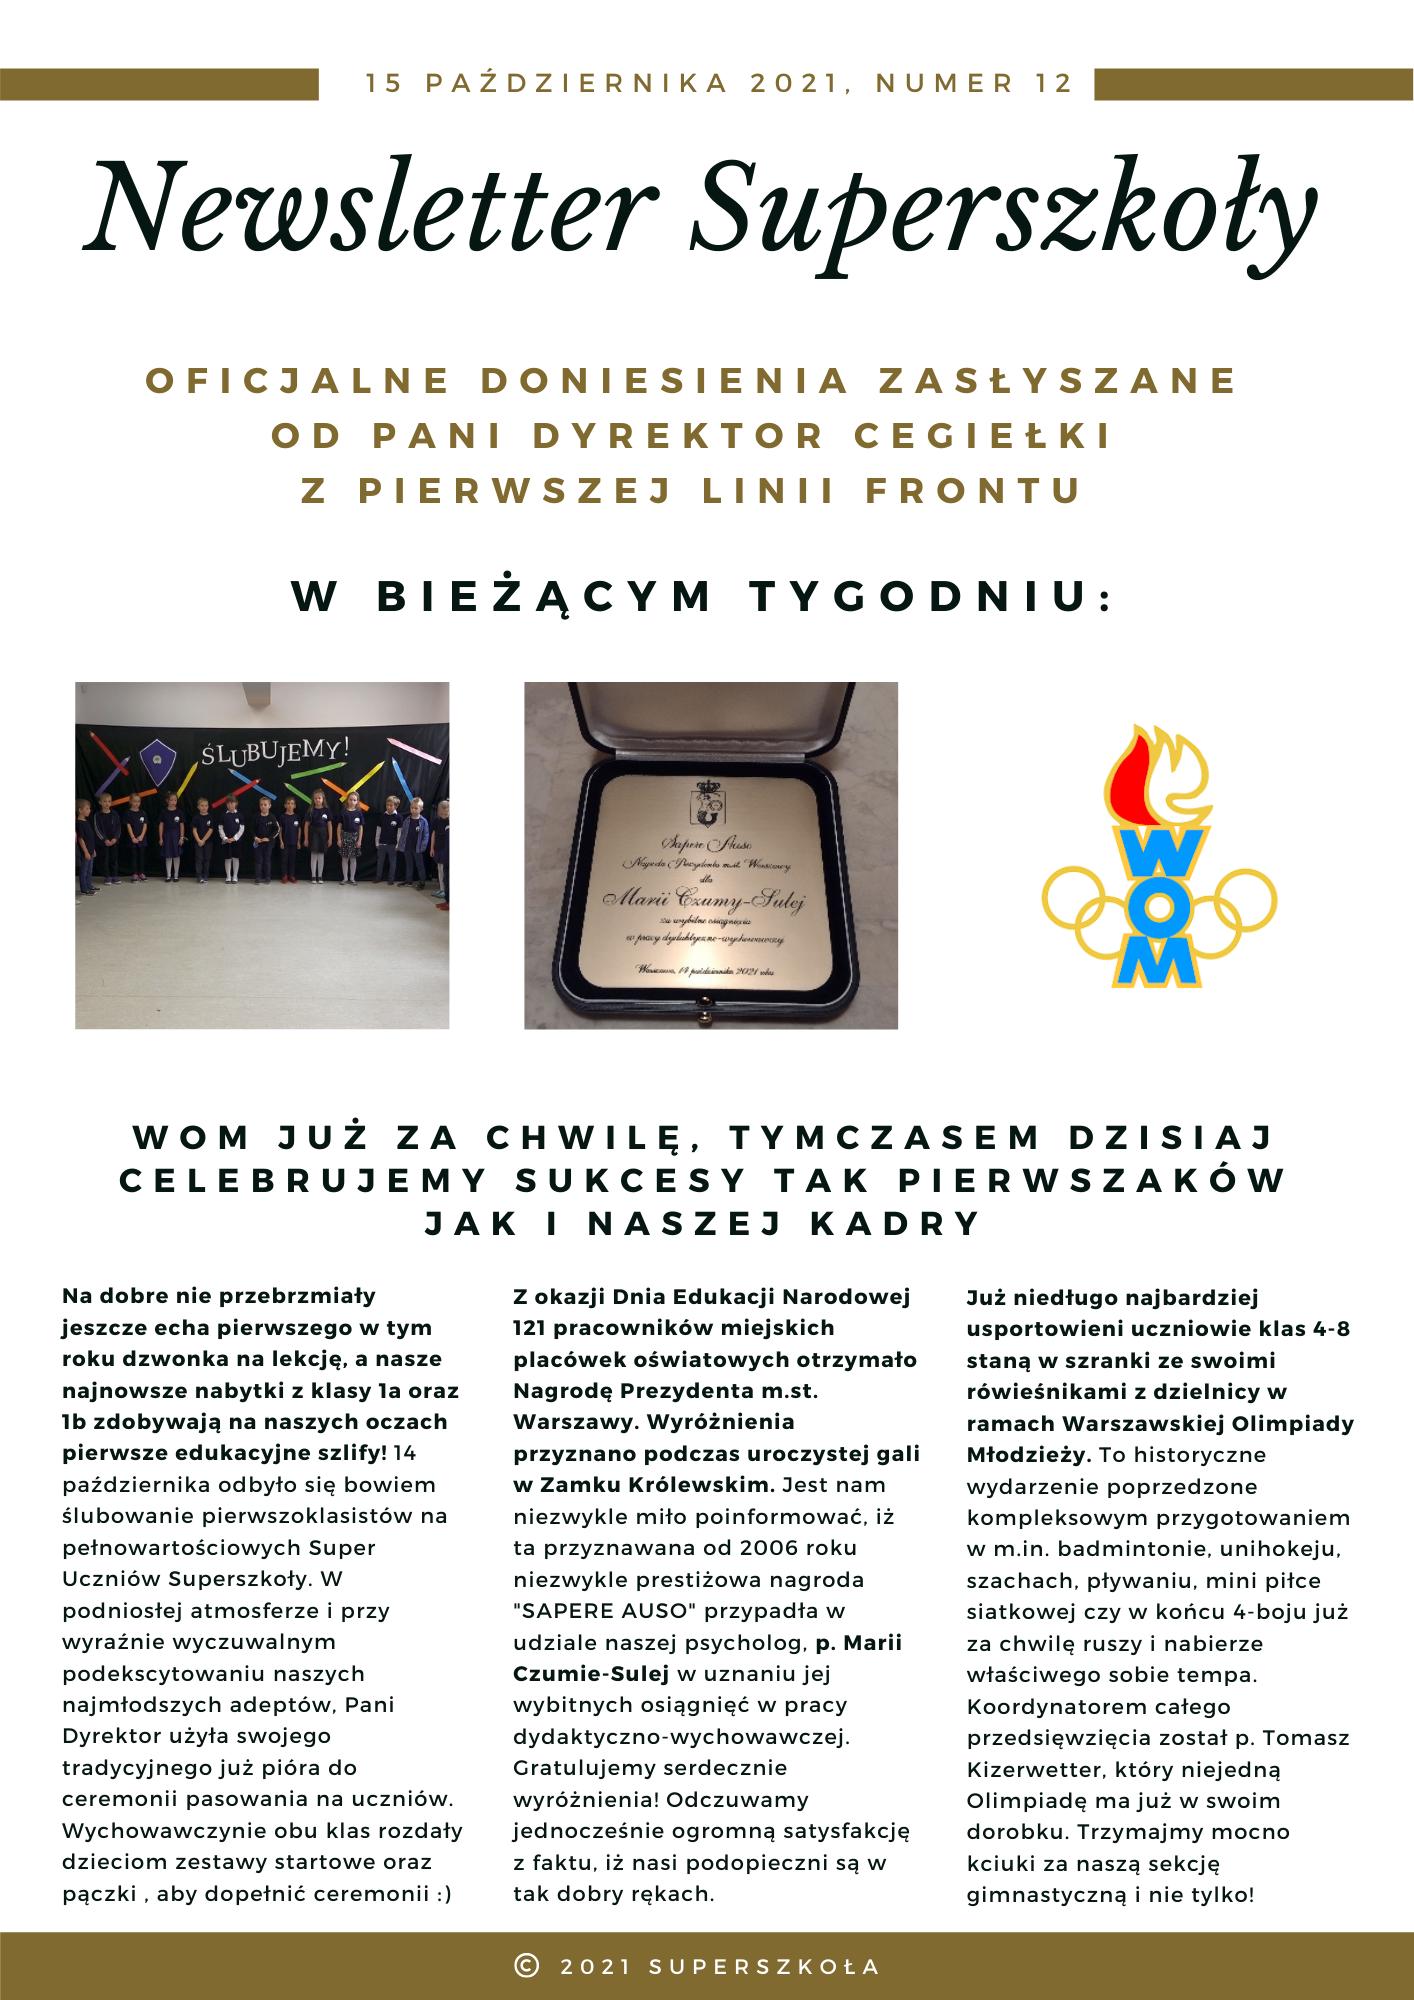 Newsletter_Superszkoły_12